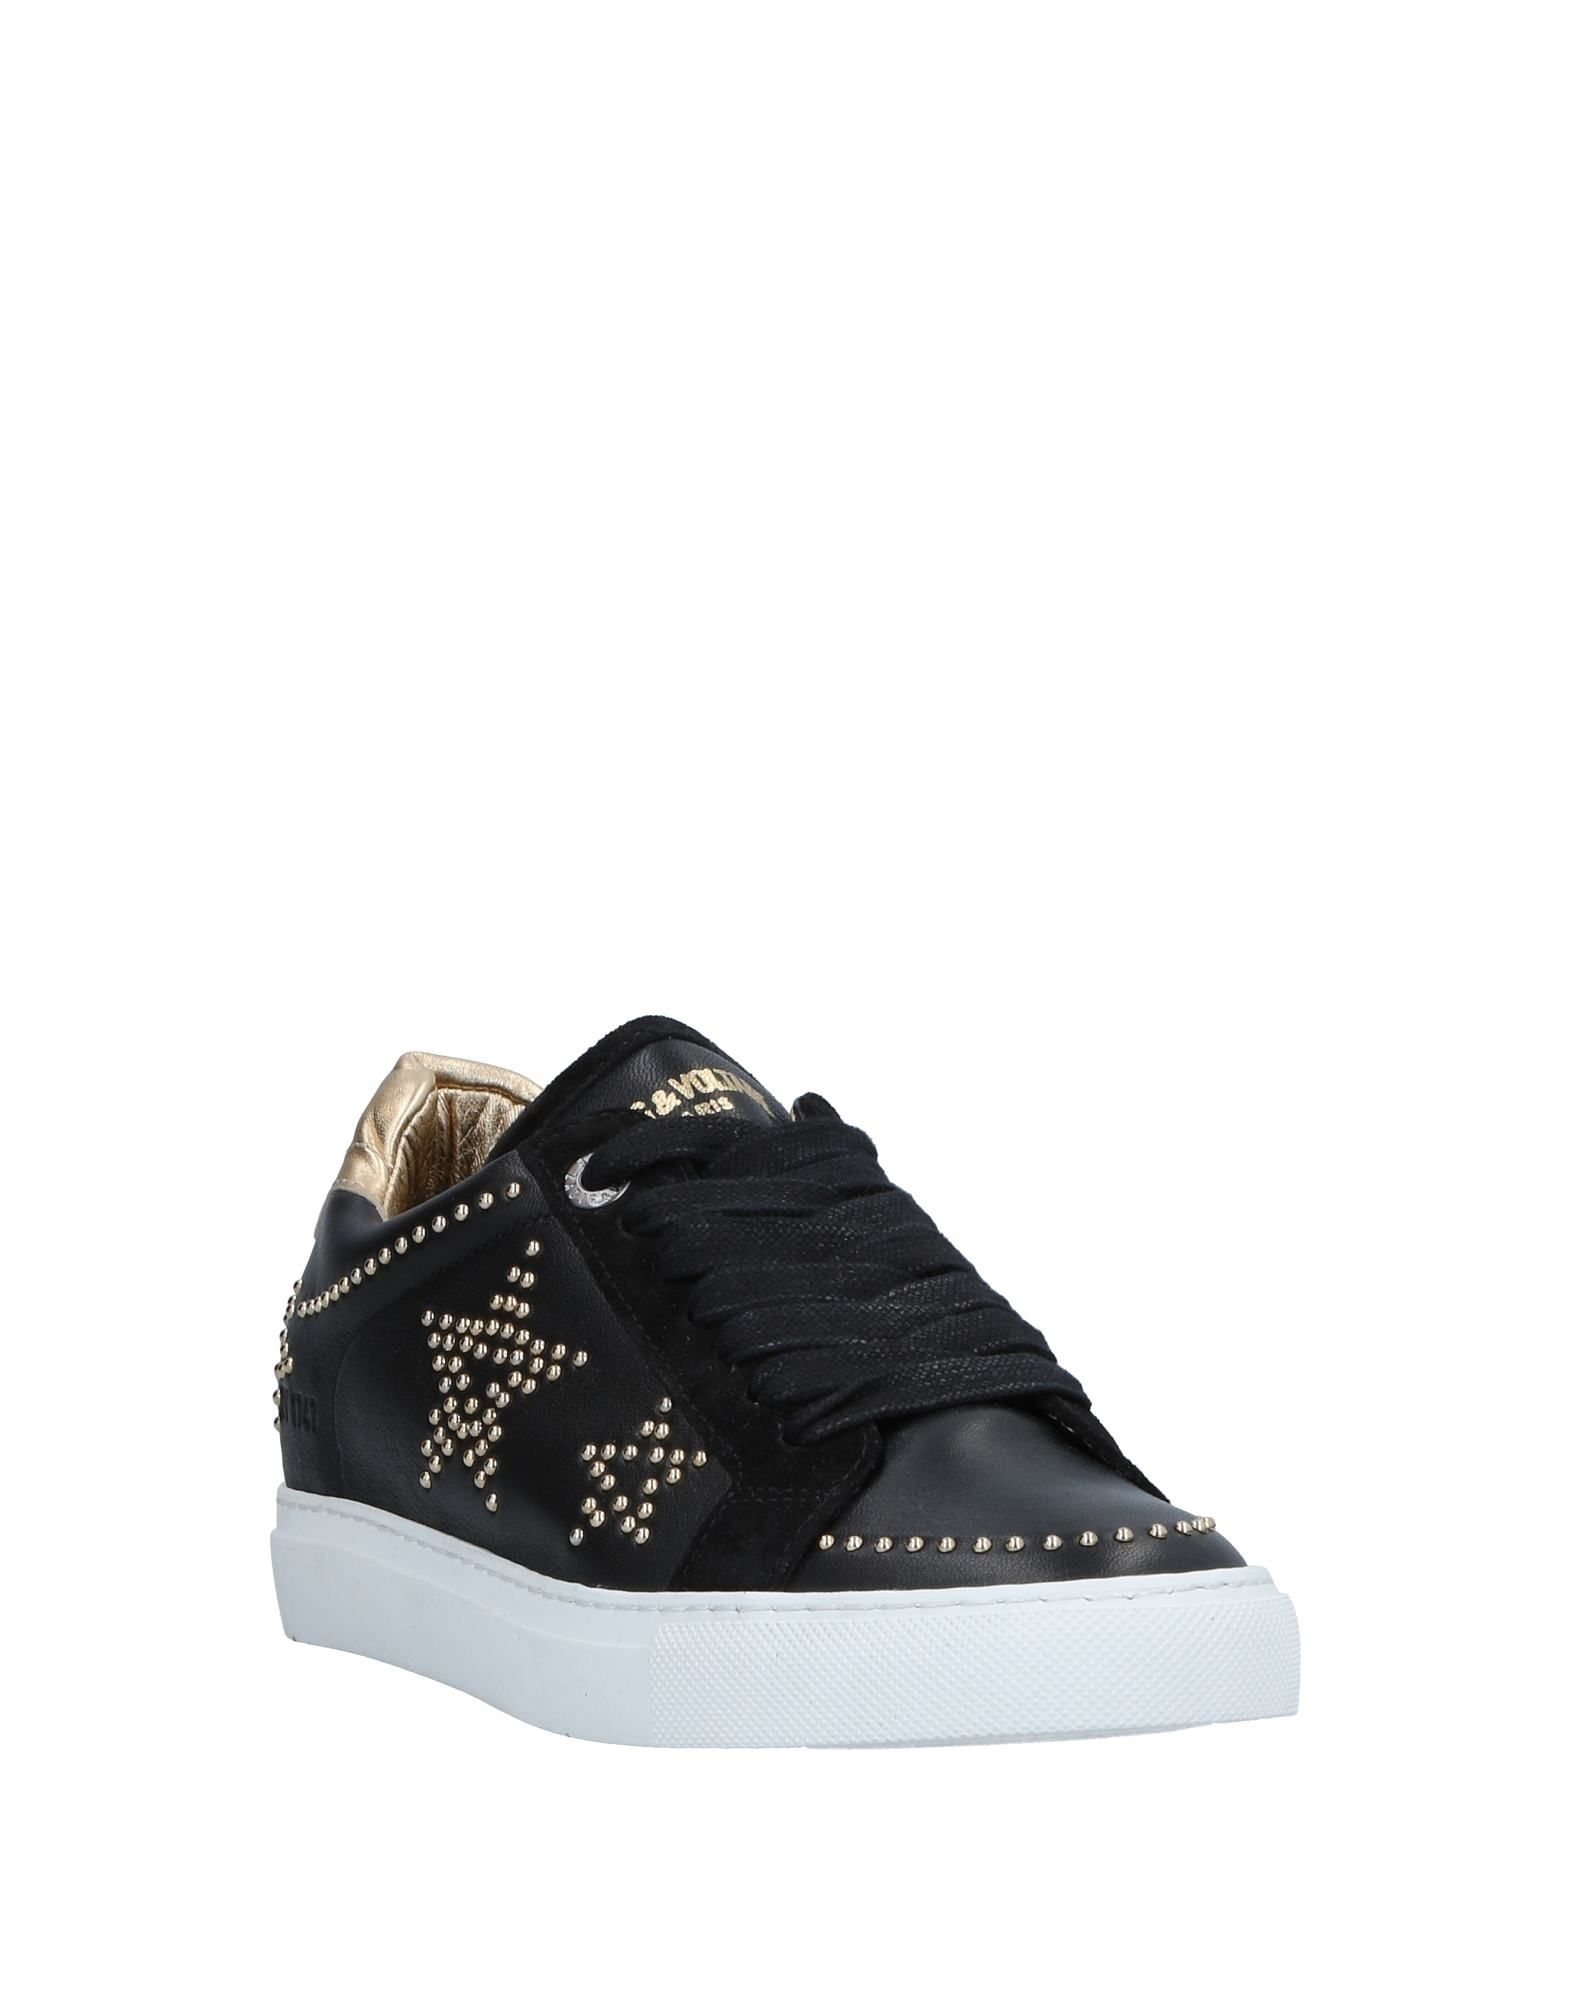 Zadig & Voltaire Sneakers Damen 11528786VG  11528786VG Damen Neue Schuhe 33b146